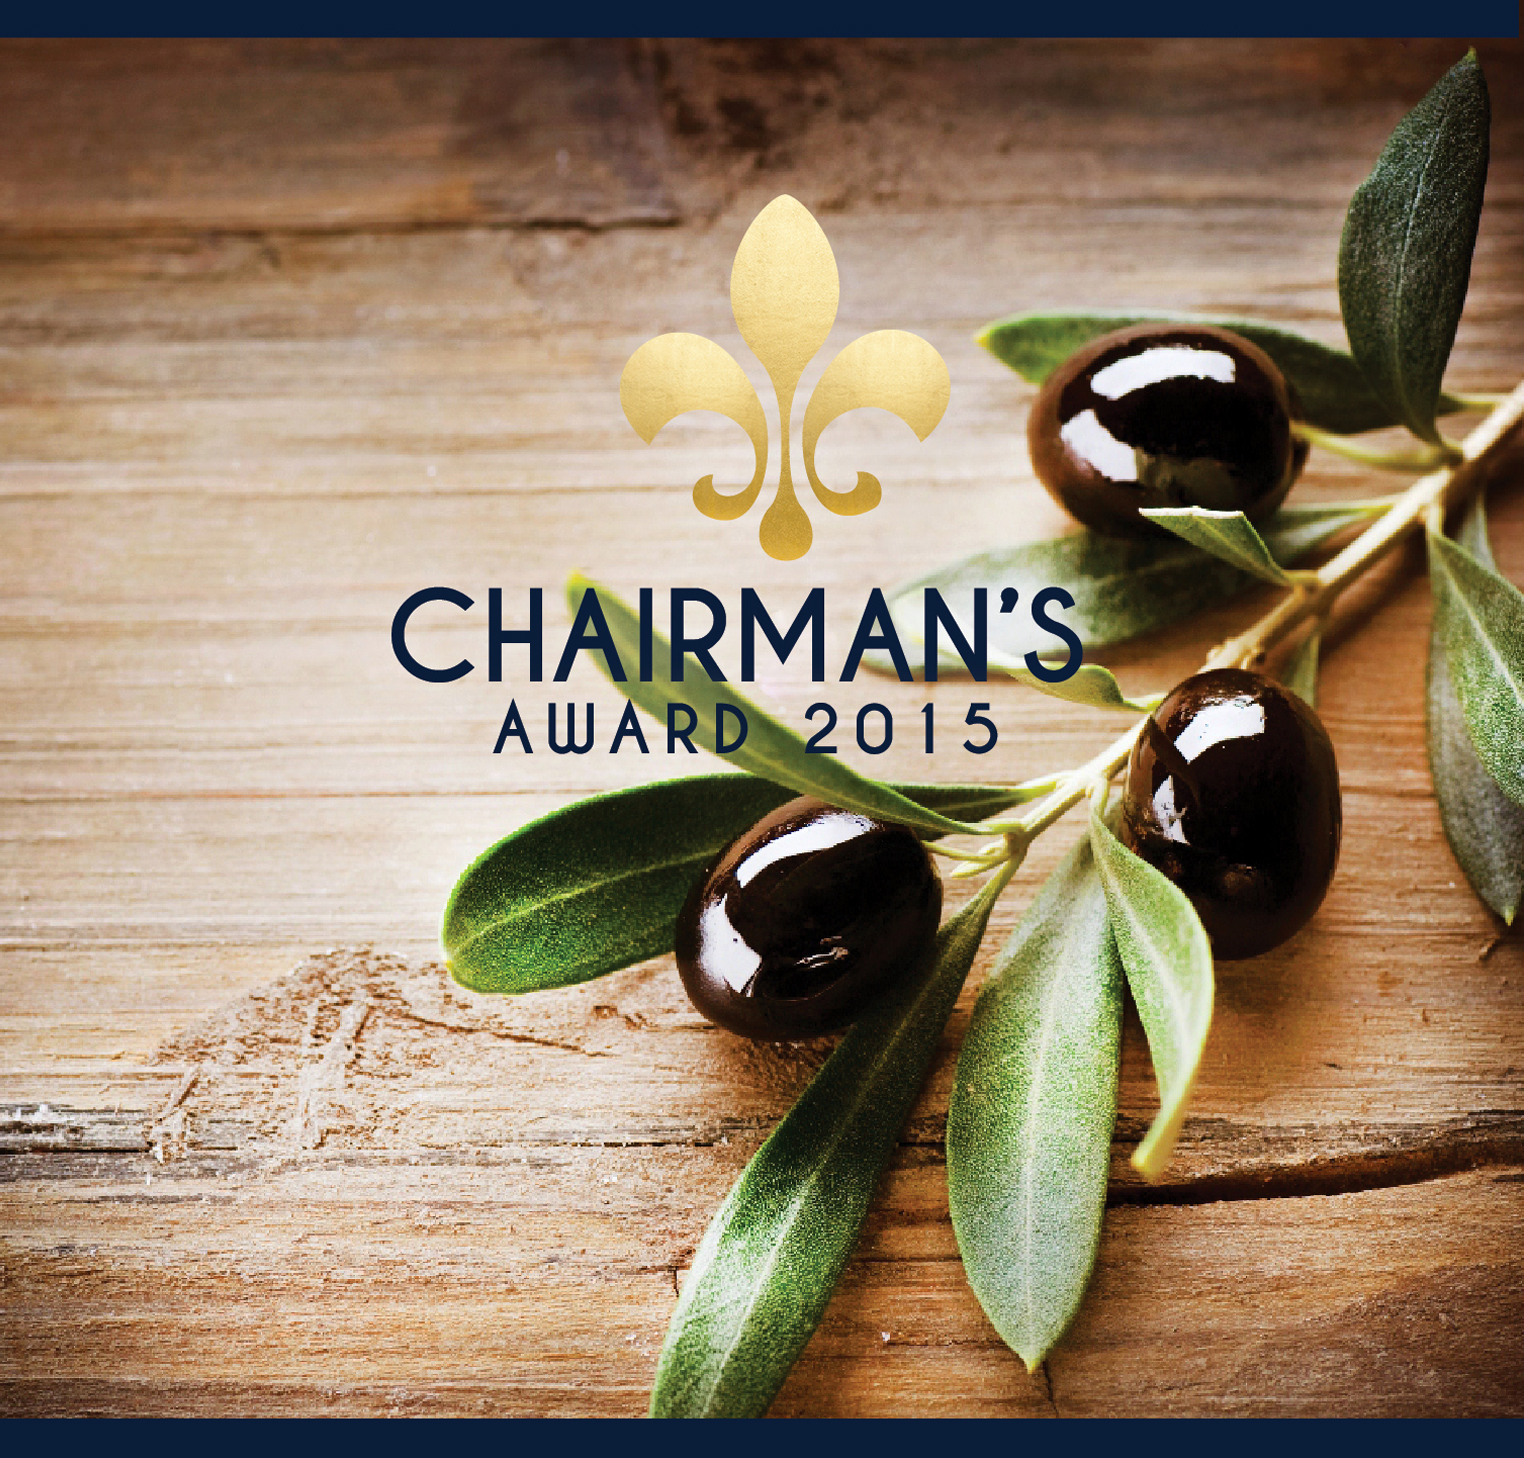 Liberty Mutual Chairman's award design and marketing campaign